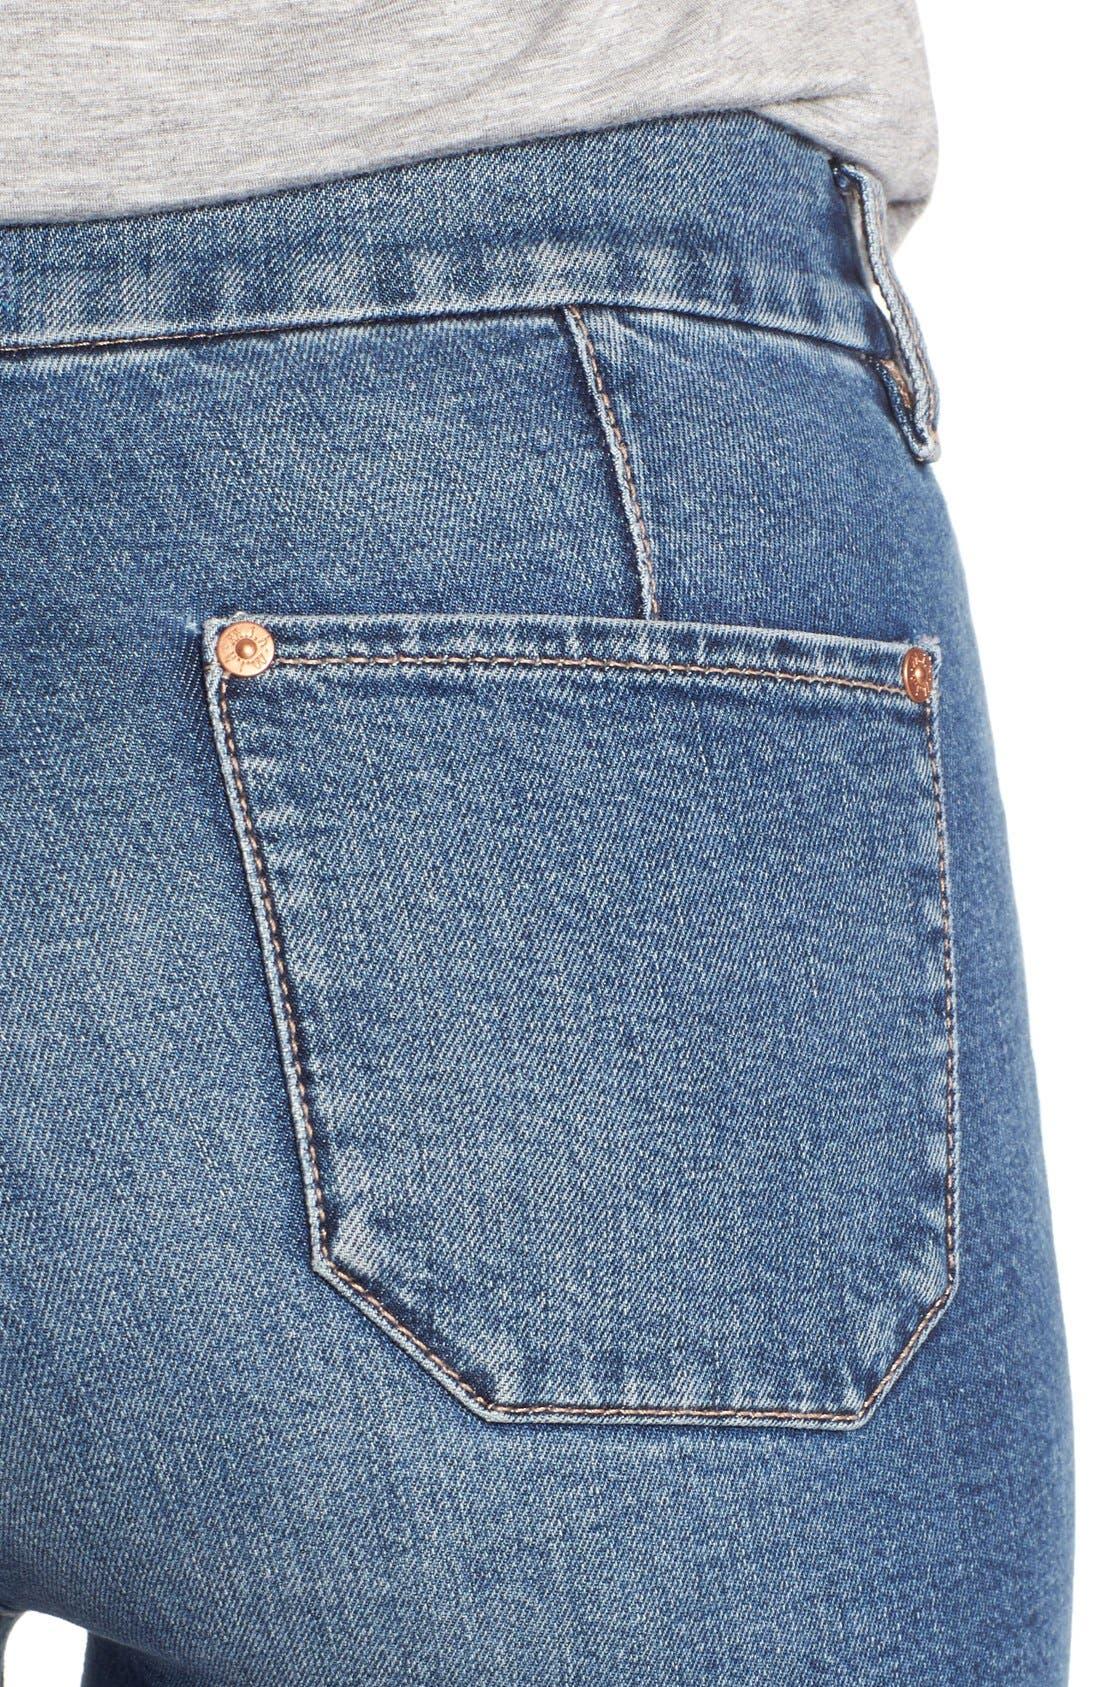 Alternate Image 4  - M.i.h.Jeans 'Marrakesh' Flare Jeans